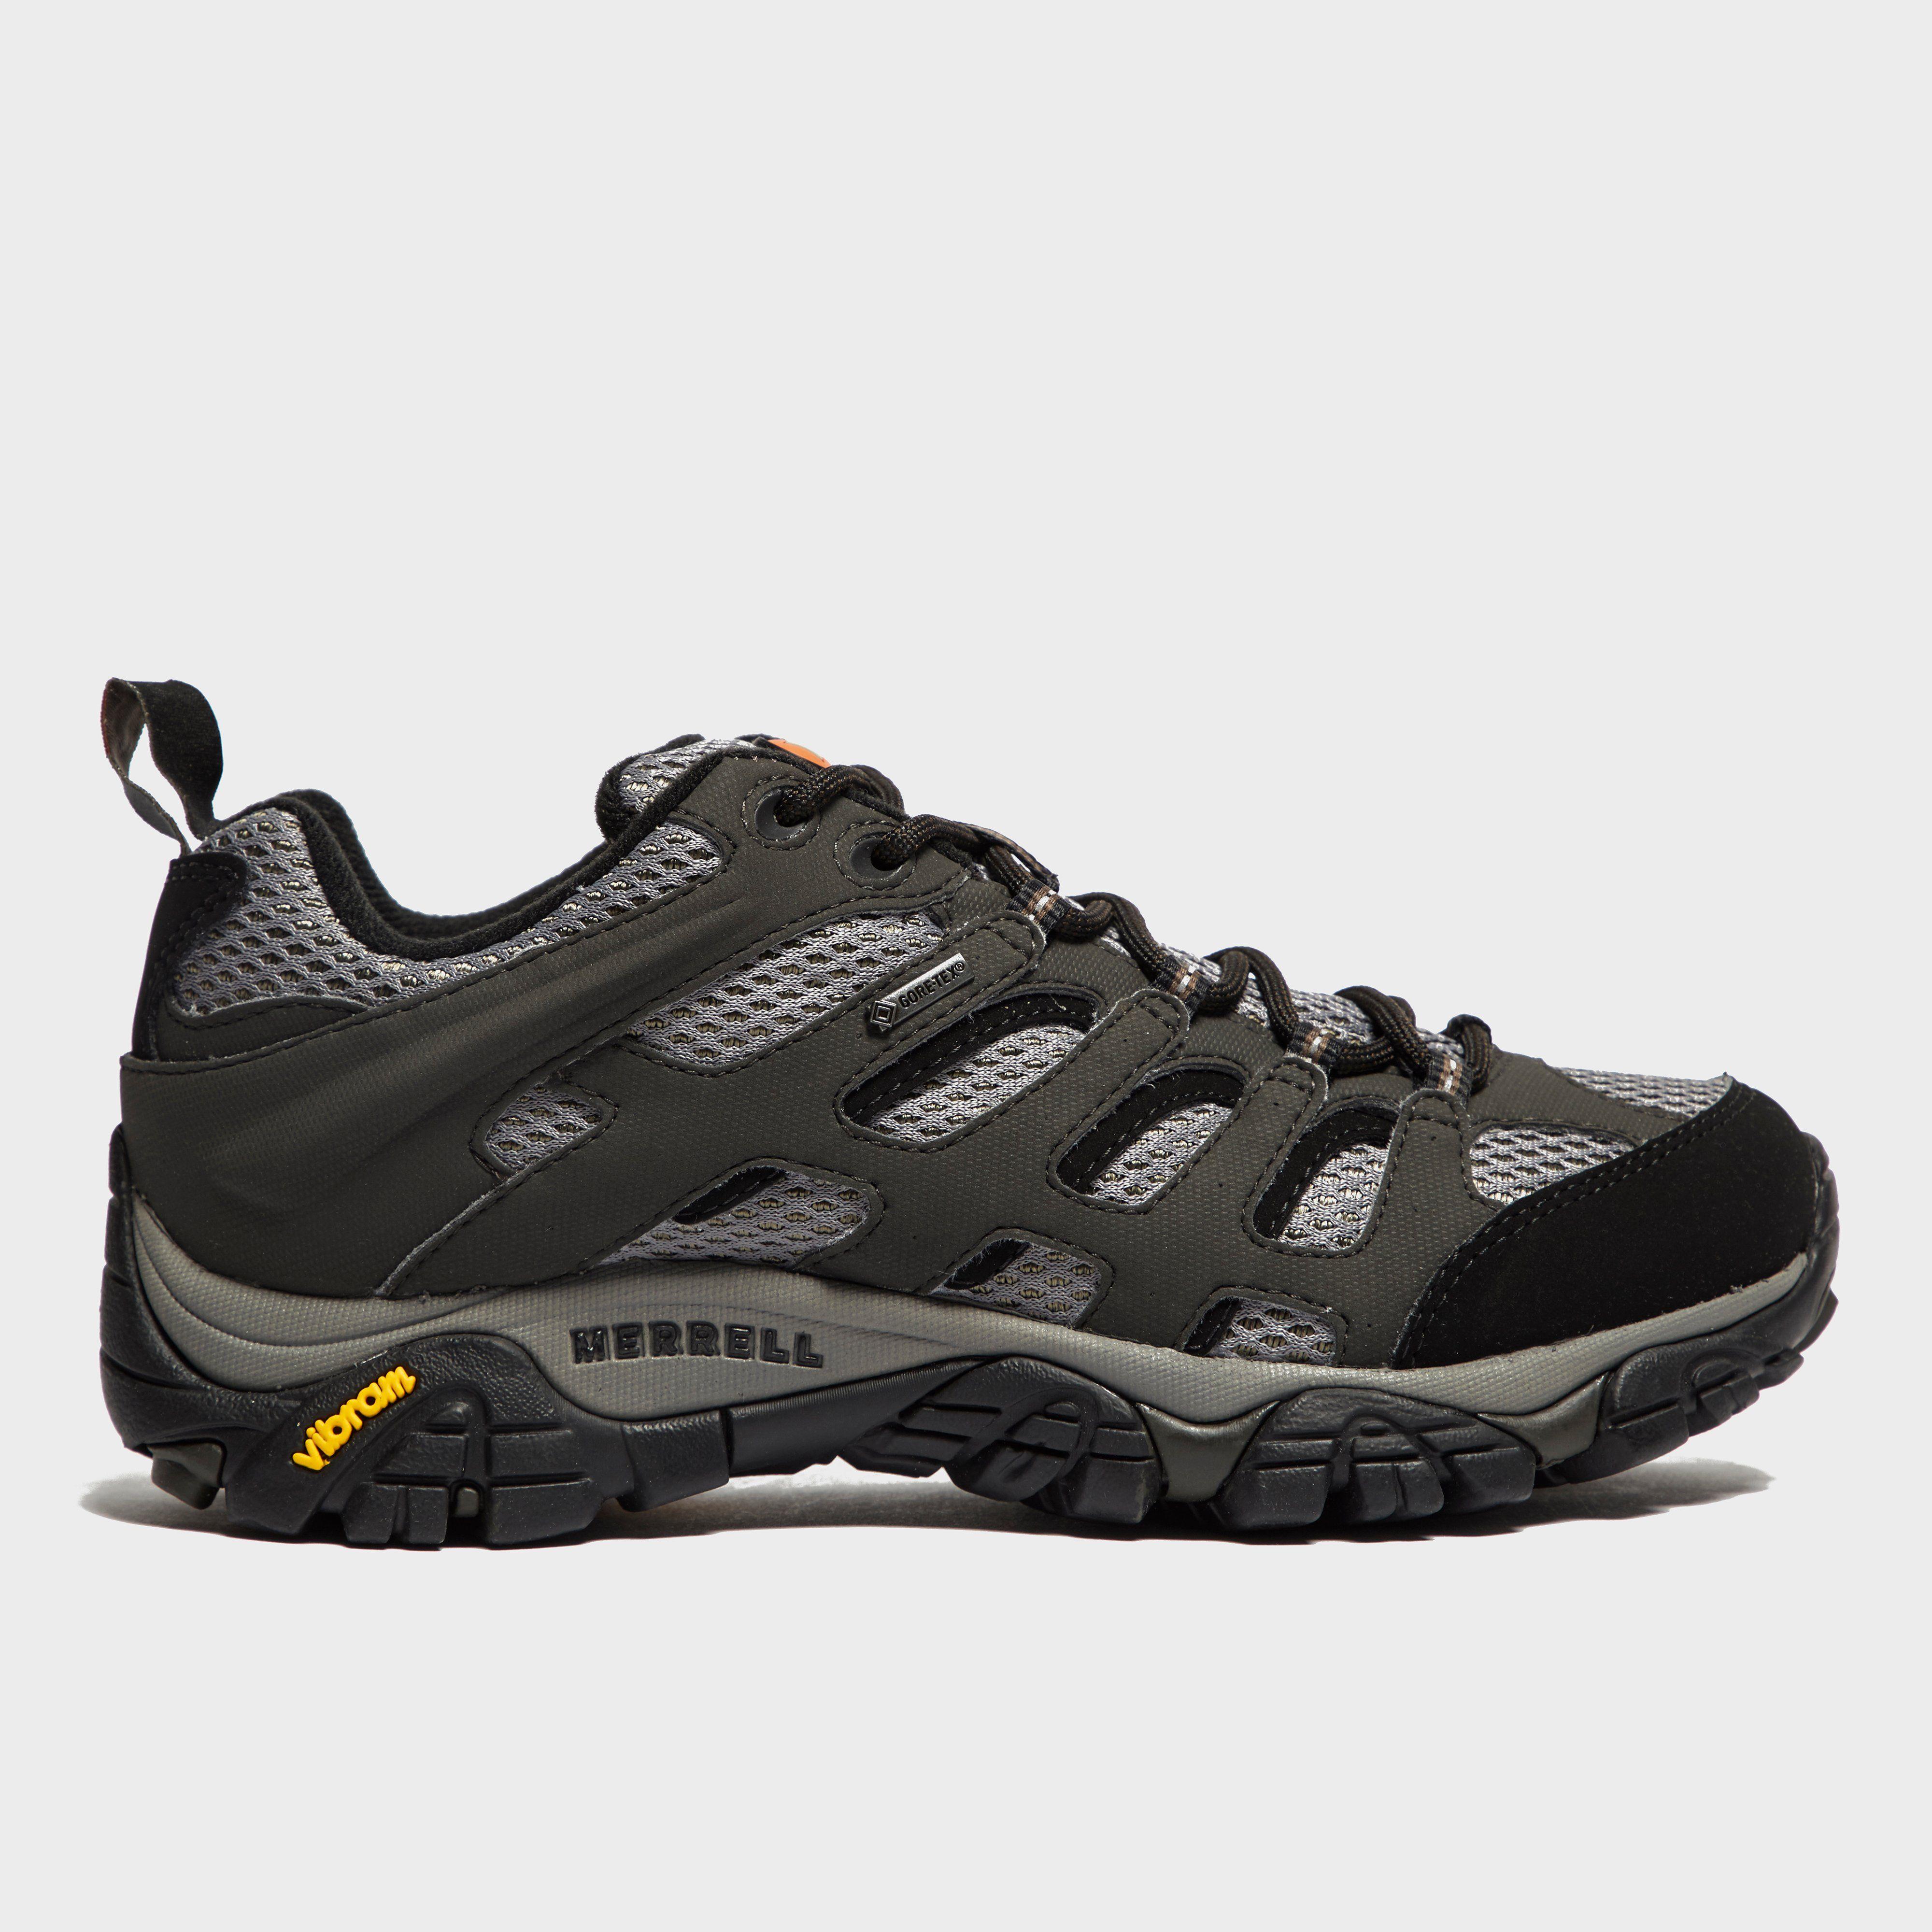 MERRELL Women's Moab GORE-TEX® Shoe